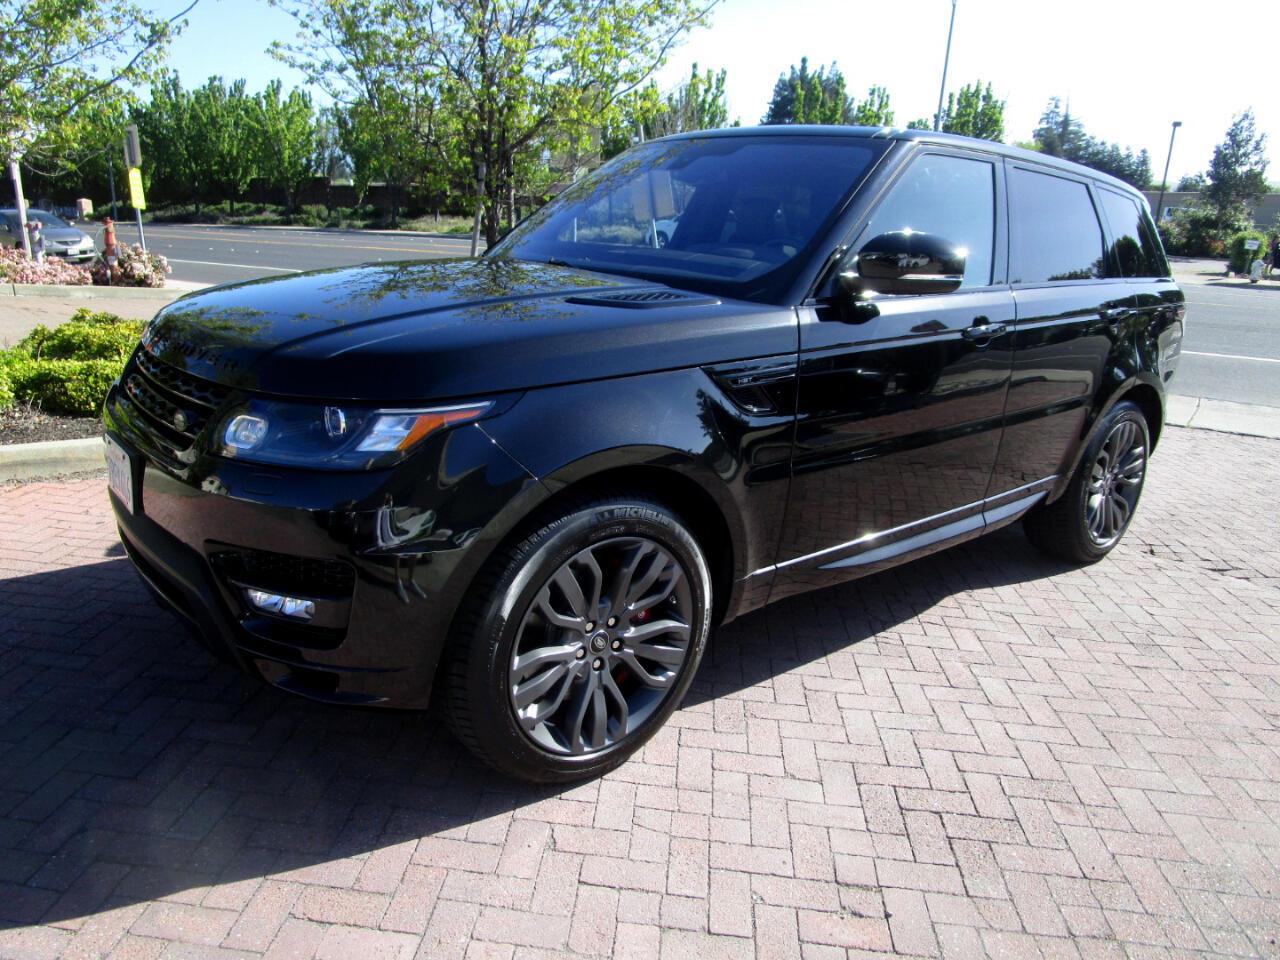 2016 Land Rover Range Rover Sport RARE LIMITED EDITION HST SPORT**ENHANCED BODY KIT*